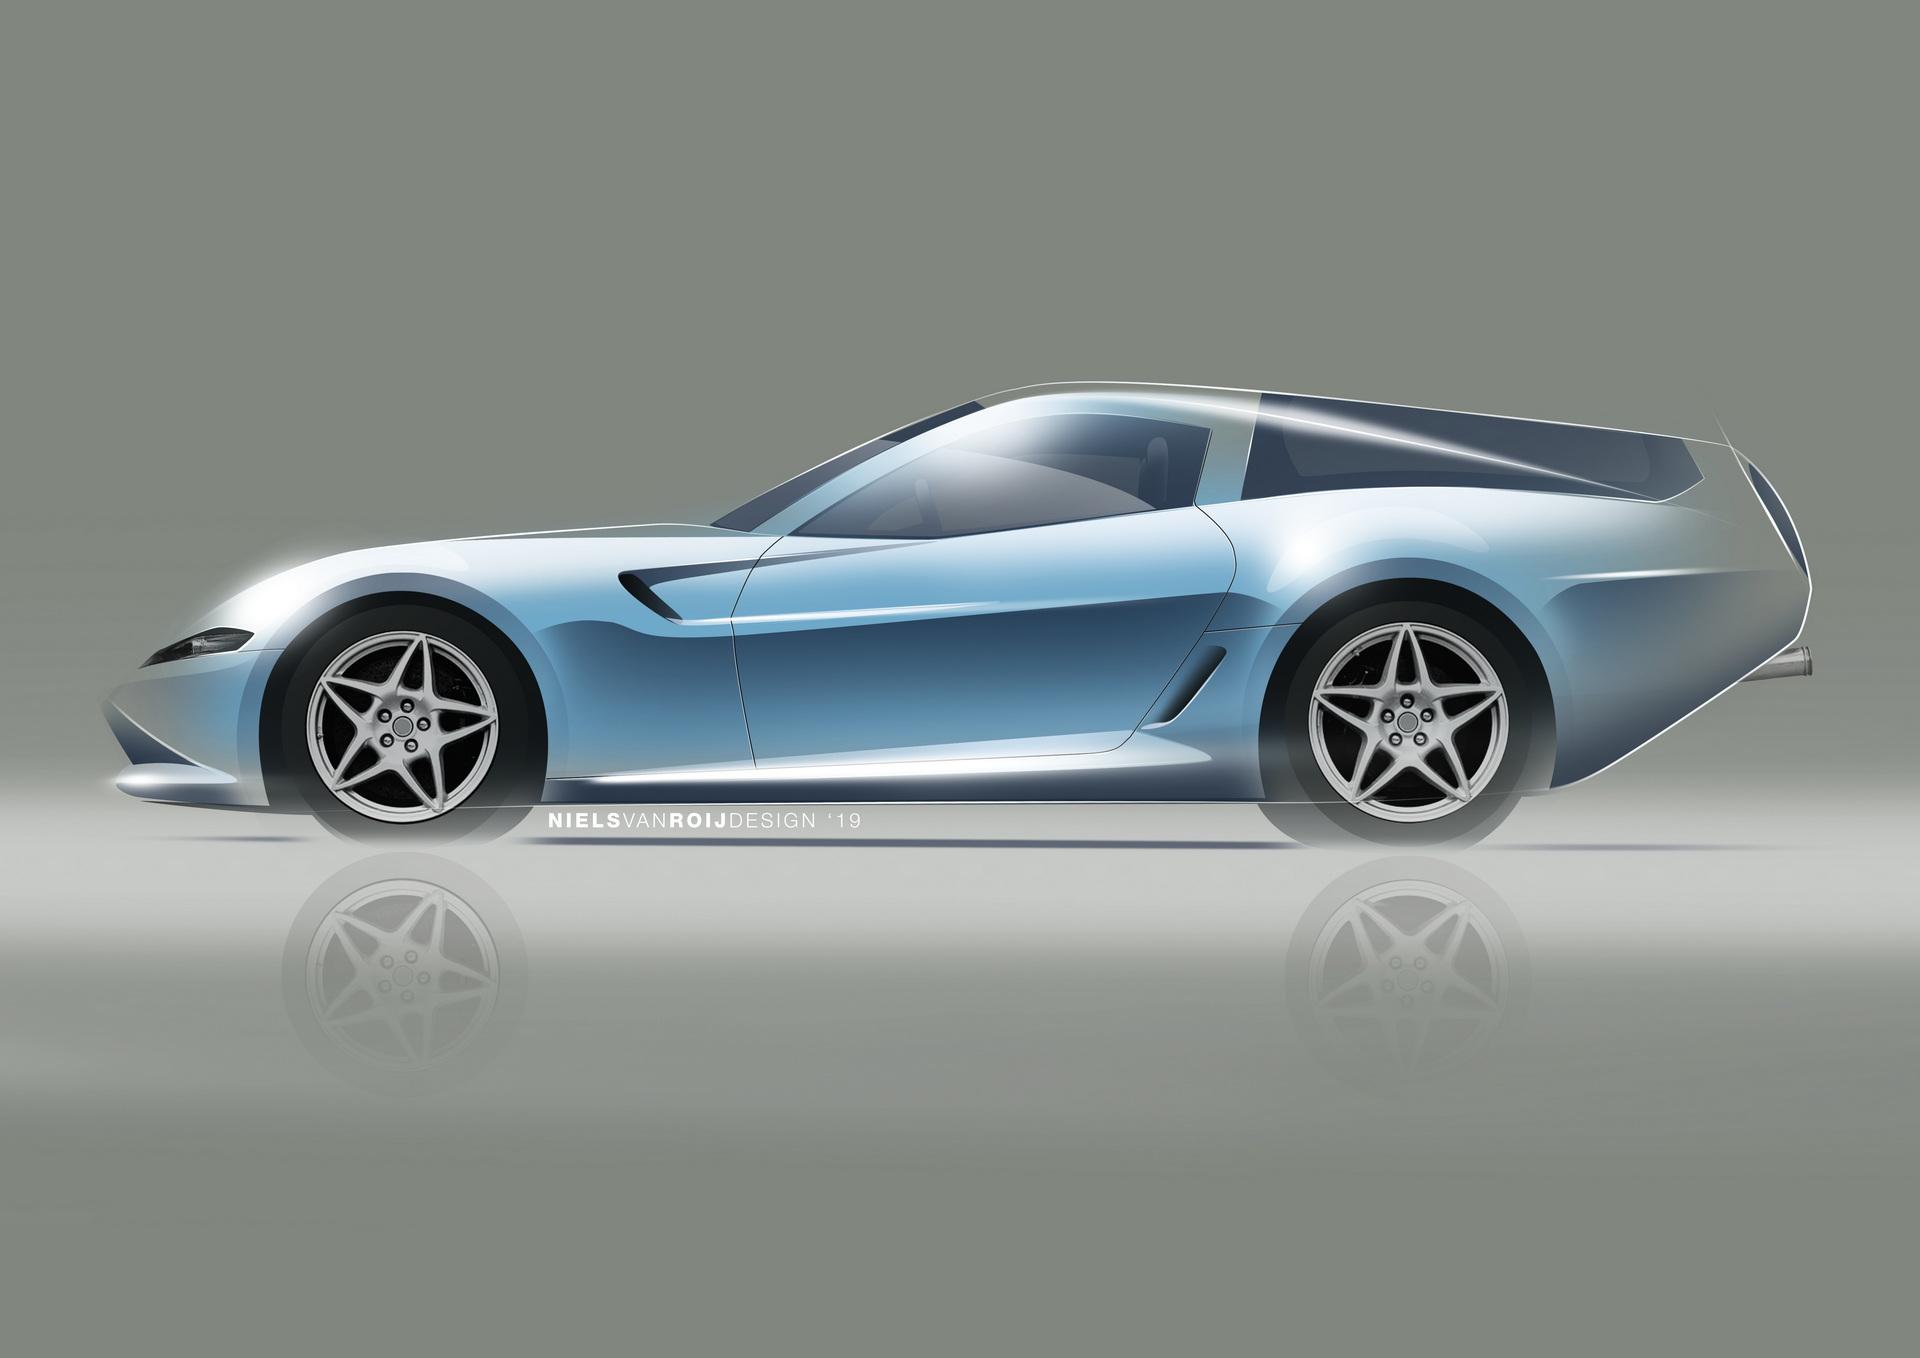 Ferrari-Daytona-Shooting-Brake-Hommage-by-Niels-van-Roij-Design-10